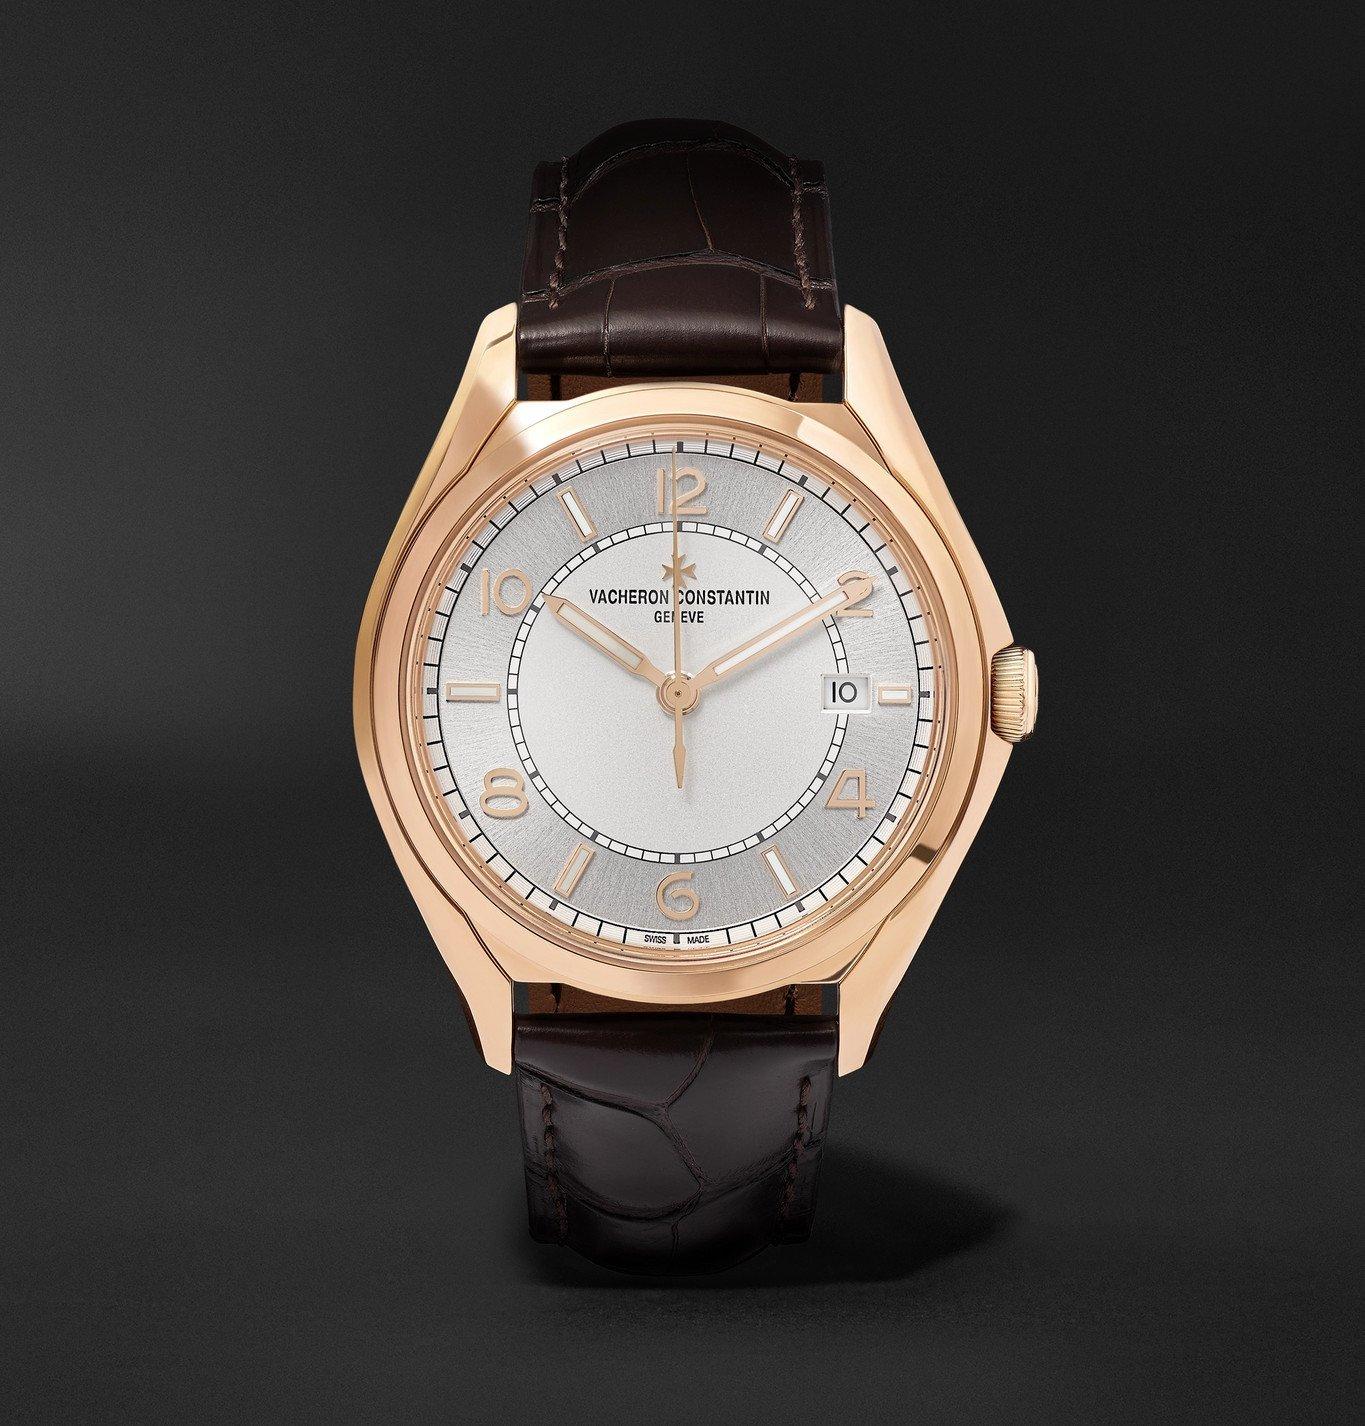 Photo: Vacheron Constantin - Fiftysix Automatic 40mm 18-Karat Pink Gold and Alligator Watch, Ref. No. 4600E/000R-B441 X46R2019 - Unknown